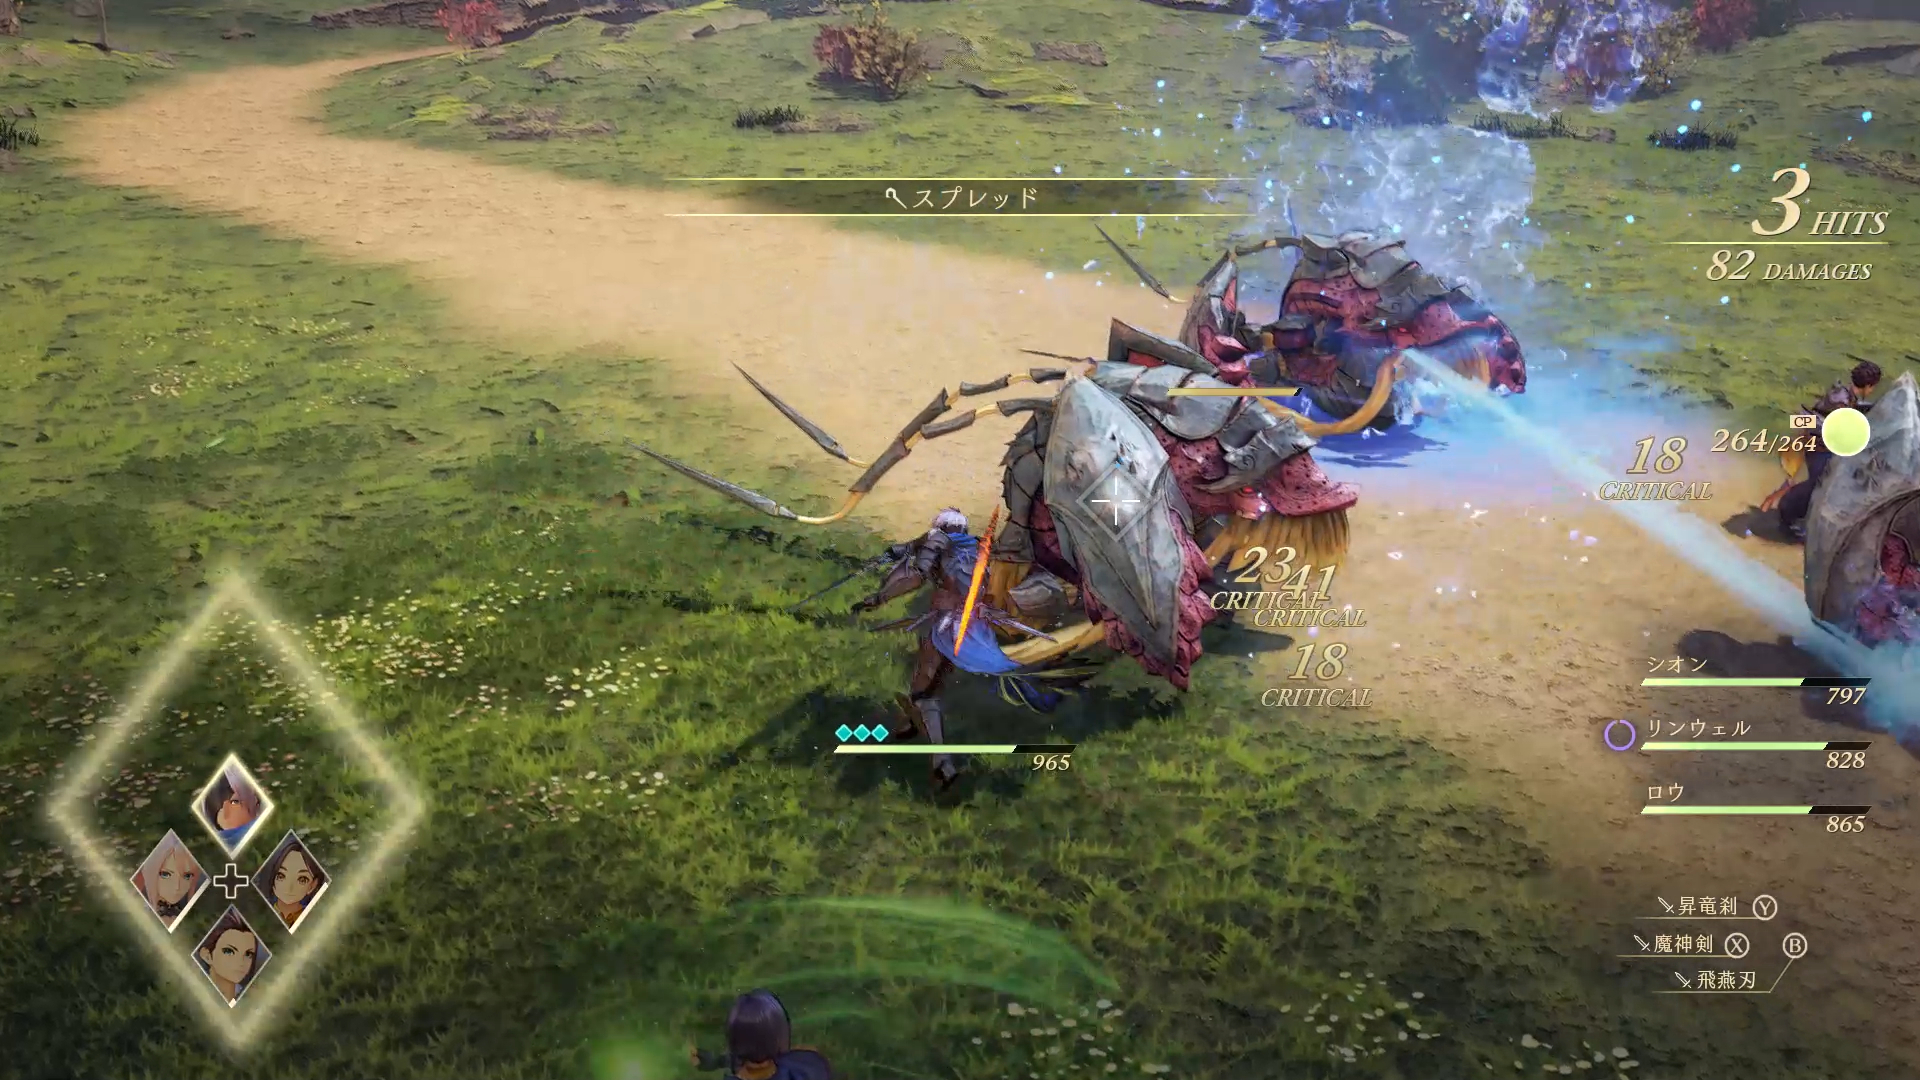 Tales of Arise new screenshots show battle gameplay in more detail – Primetimegamer.com